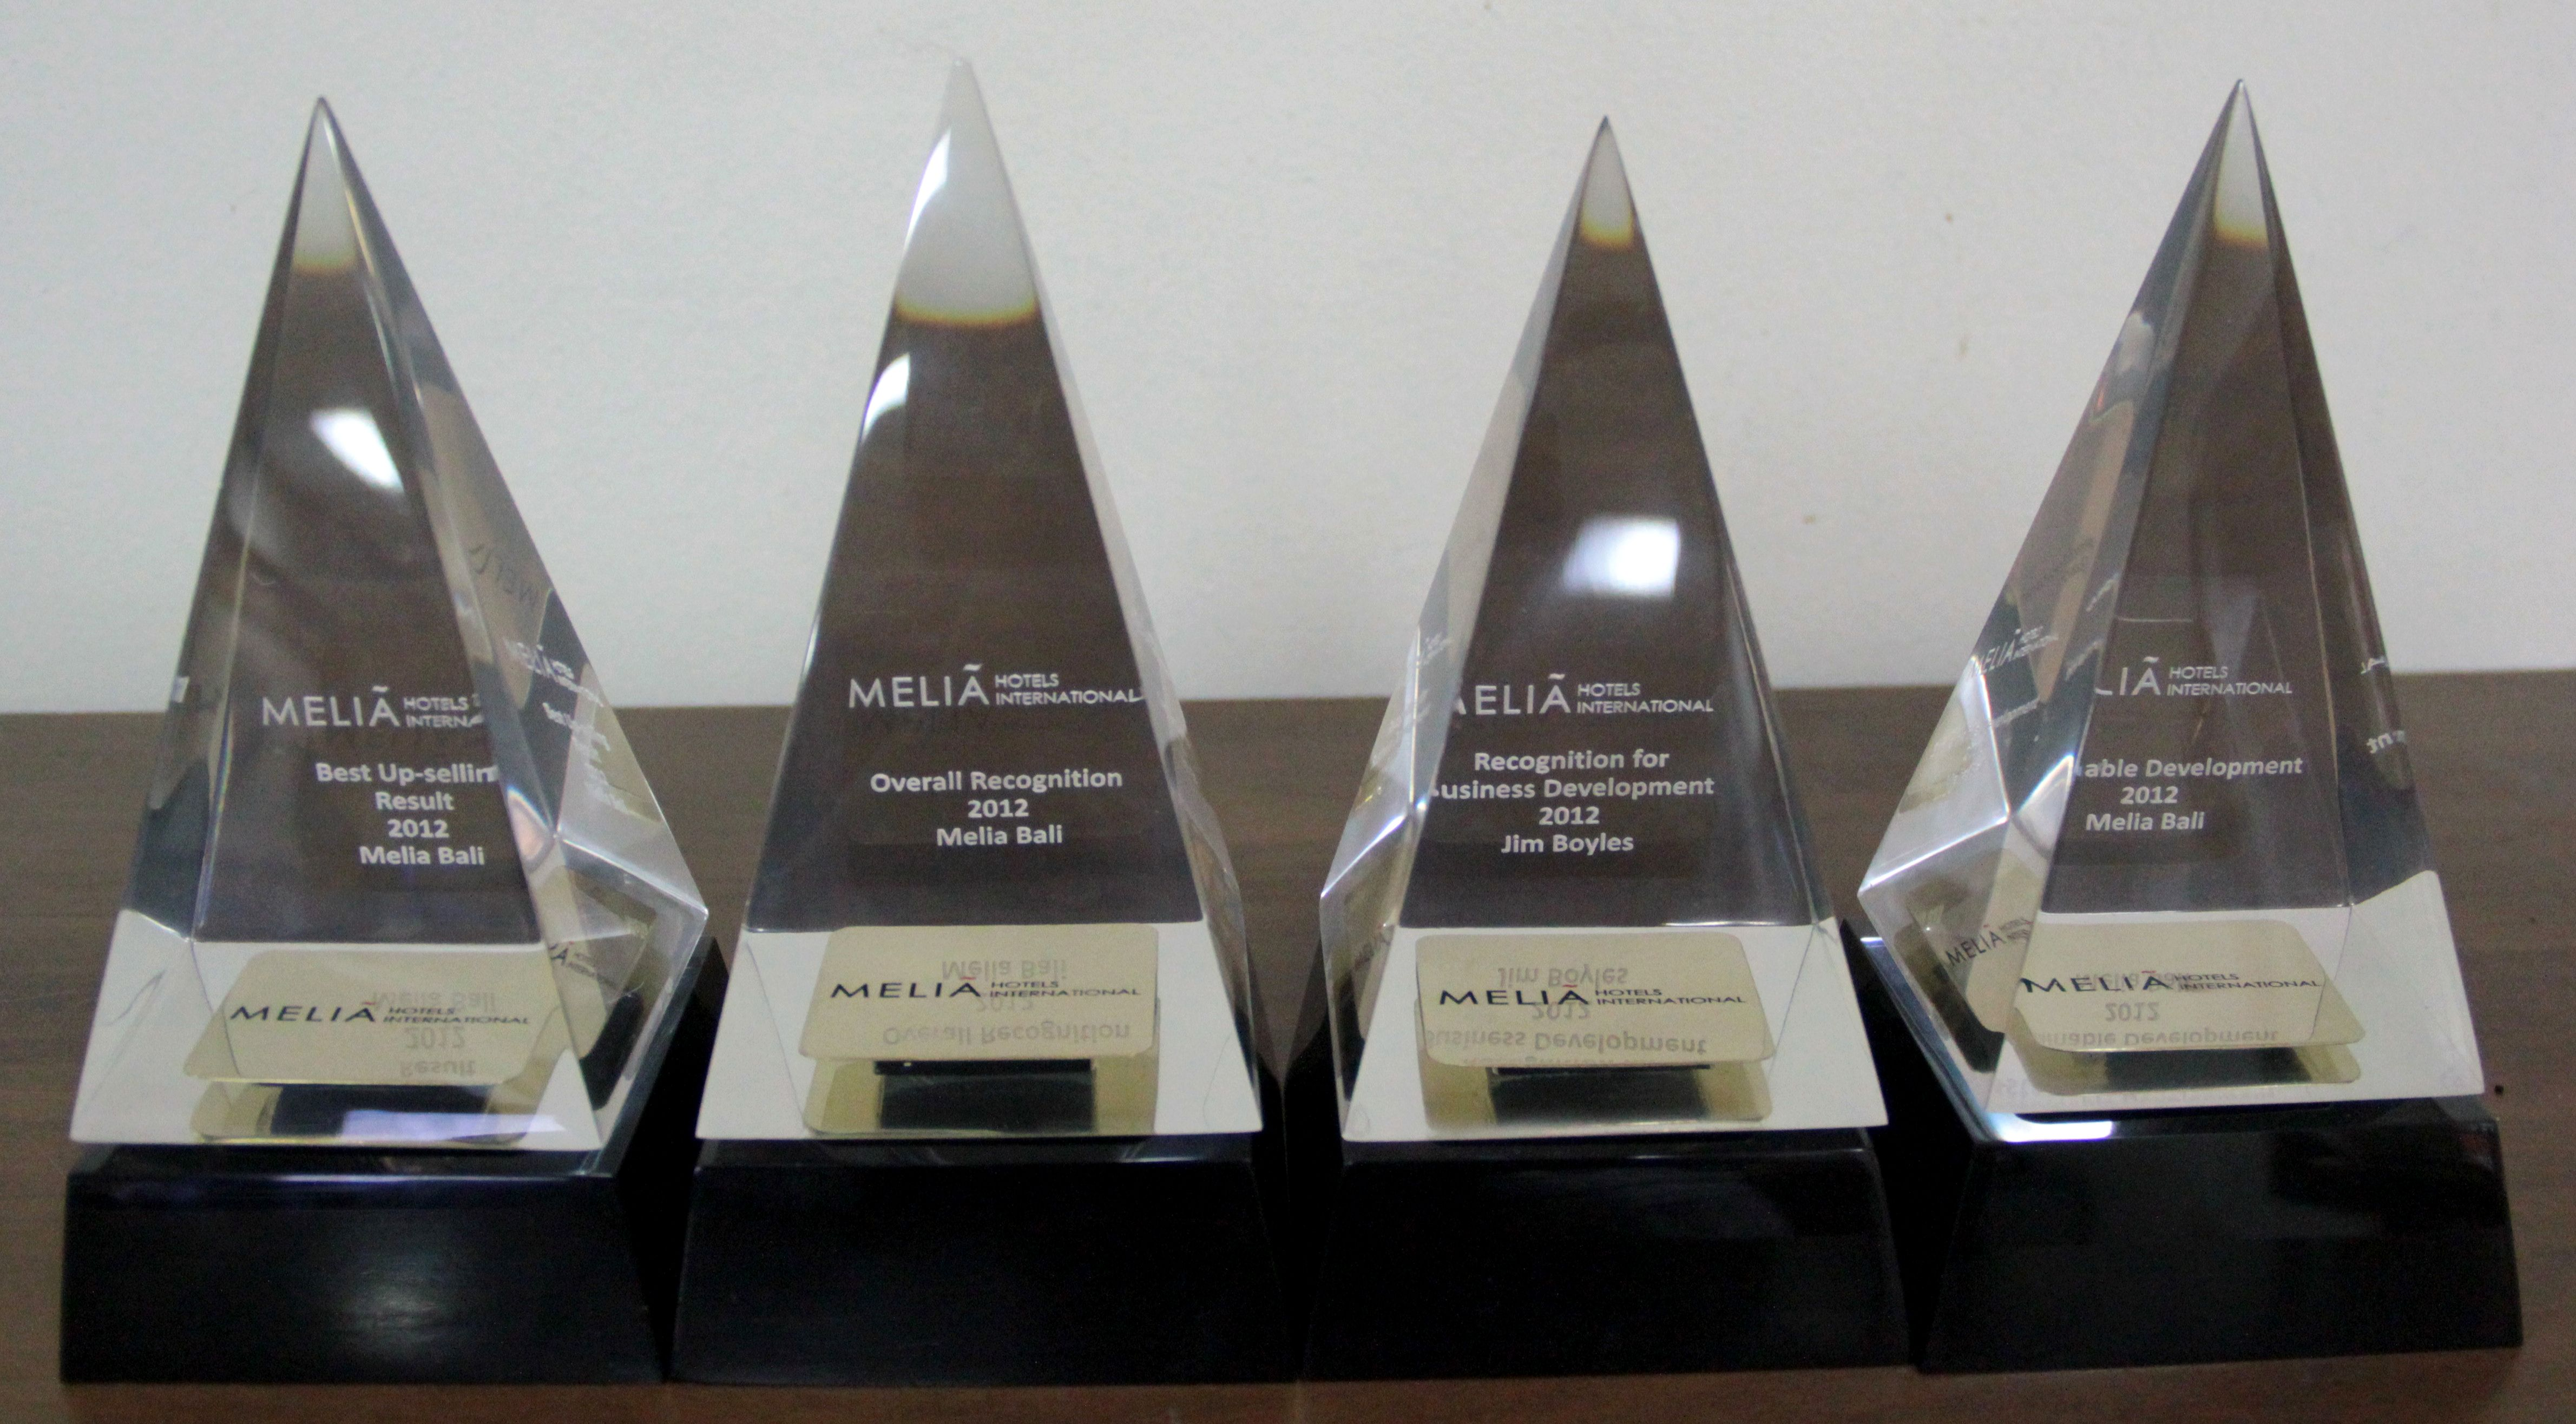 28 November 2012 MELIÃ BALI was honored to be chosen